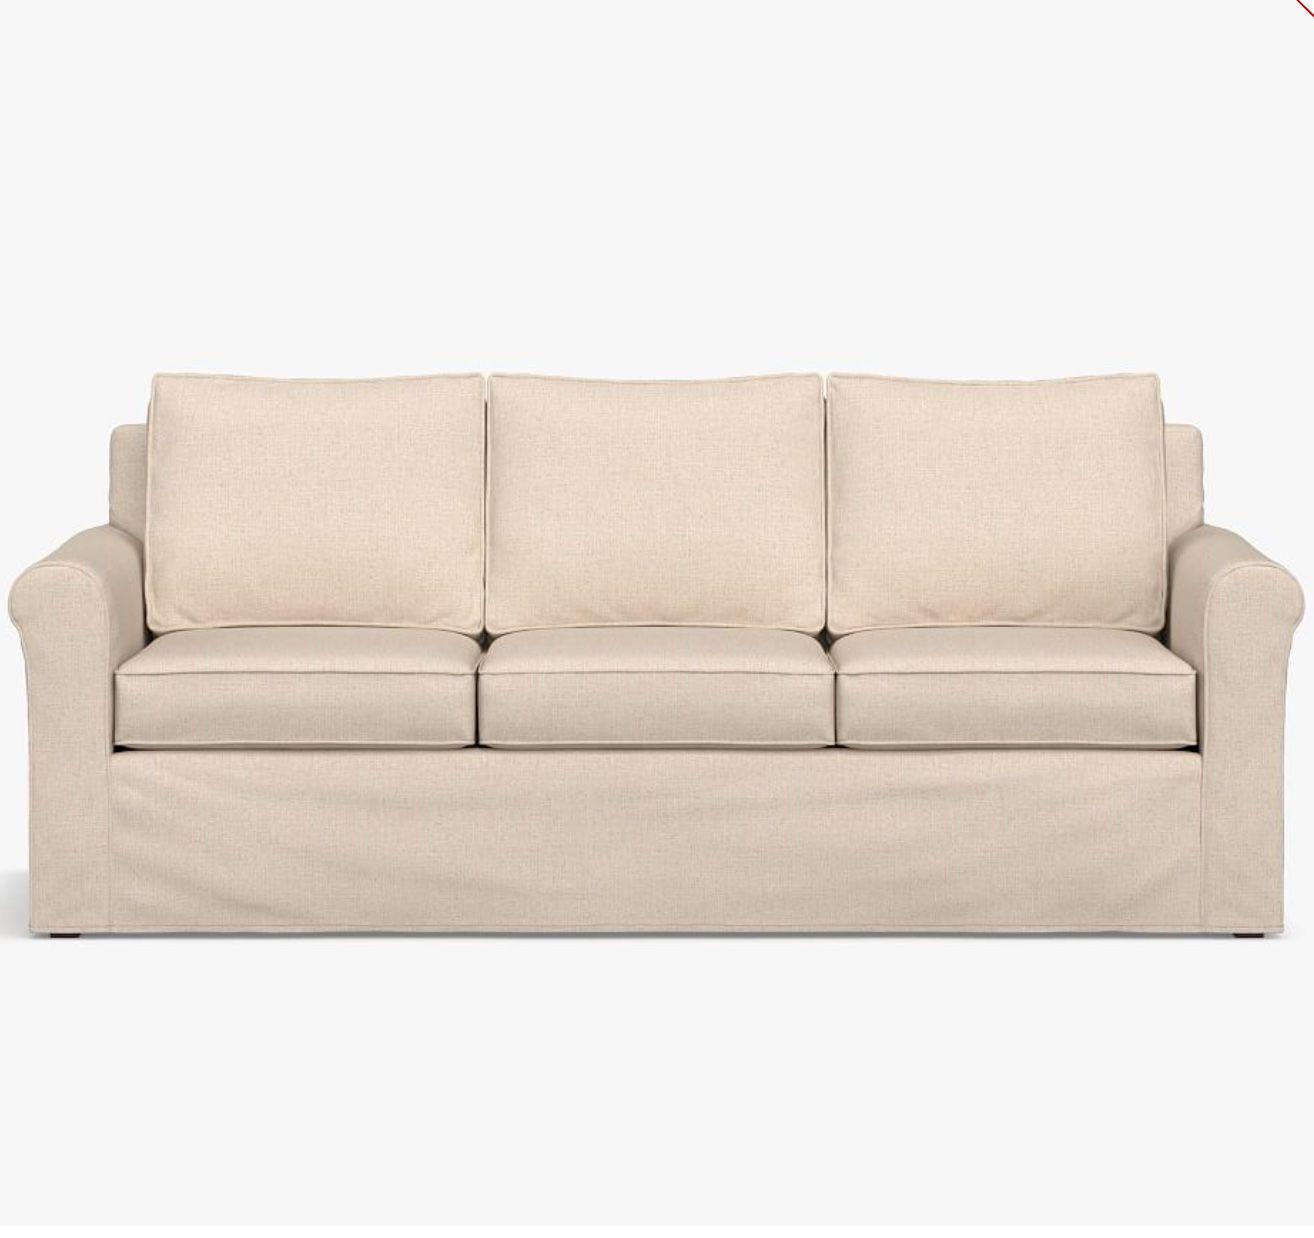 Cameron Roll Arm Slipcovered Sleeper Sofa